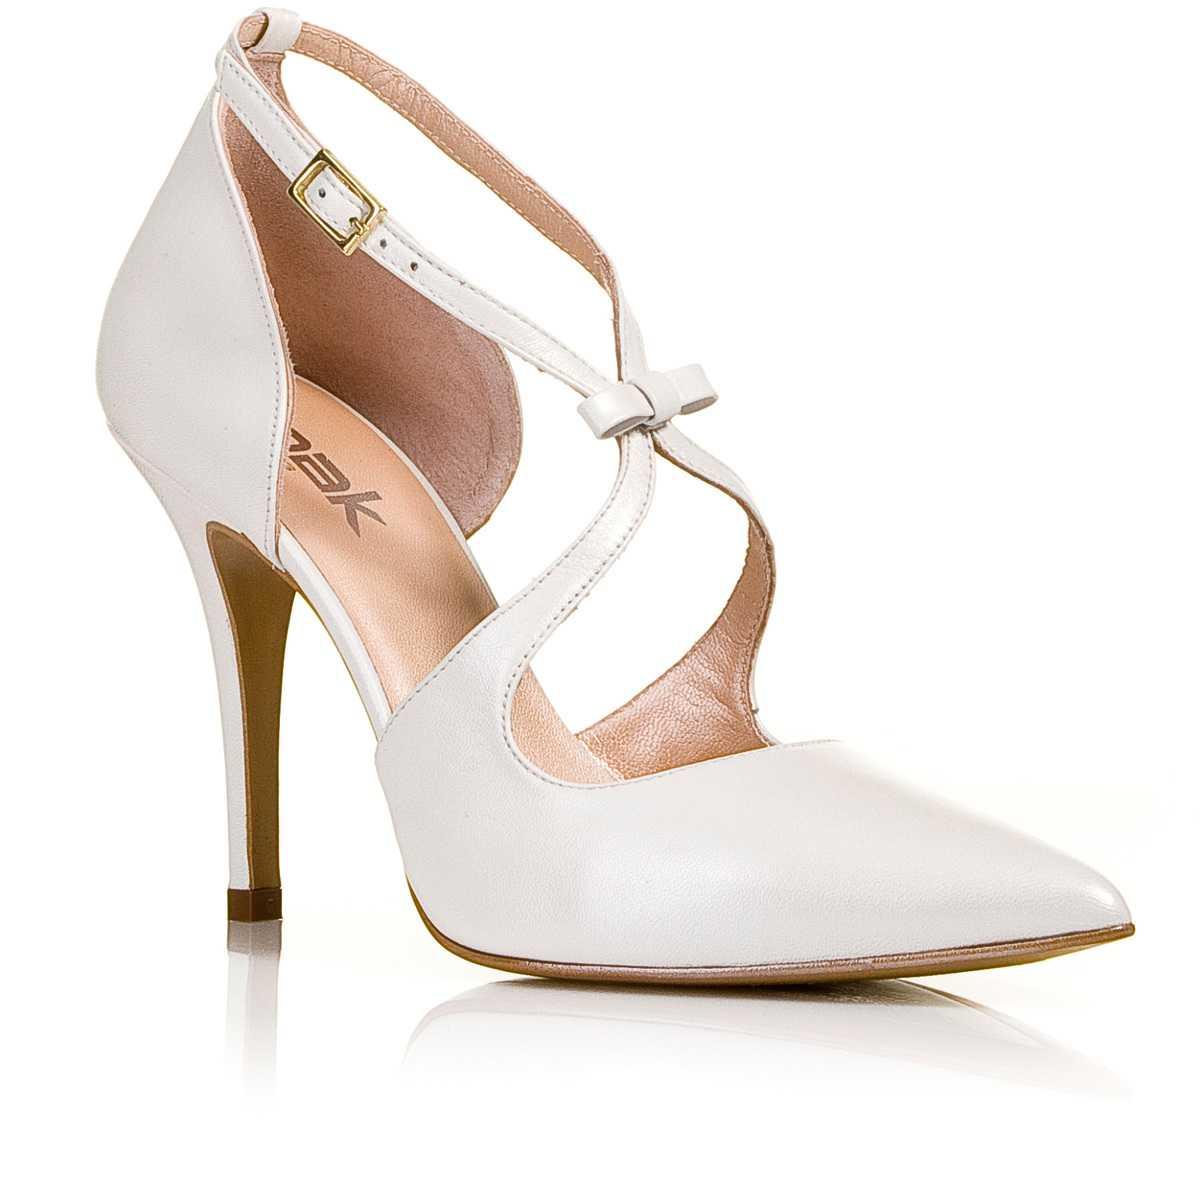 4448b7c28c2 Nak shoes 2016 - Γυναικεία Χειμερινή Collection | womanoclock.gr